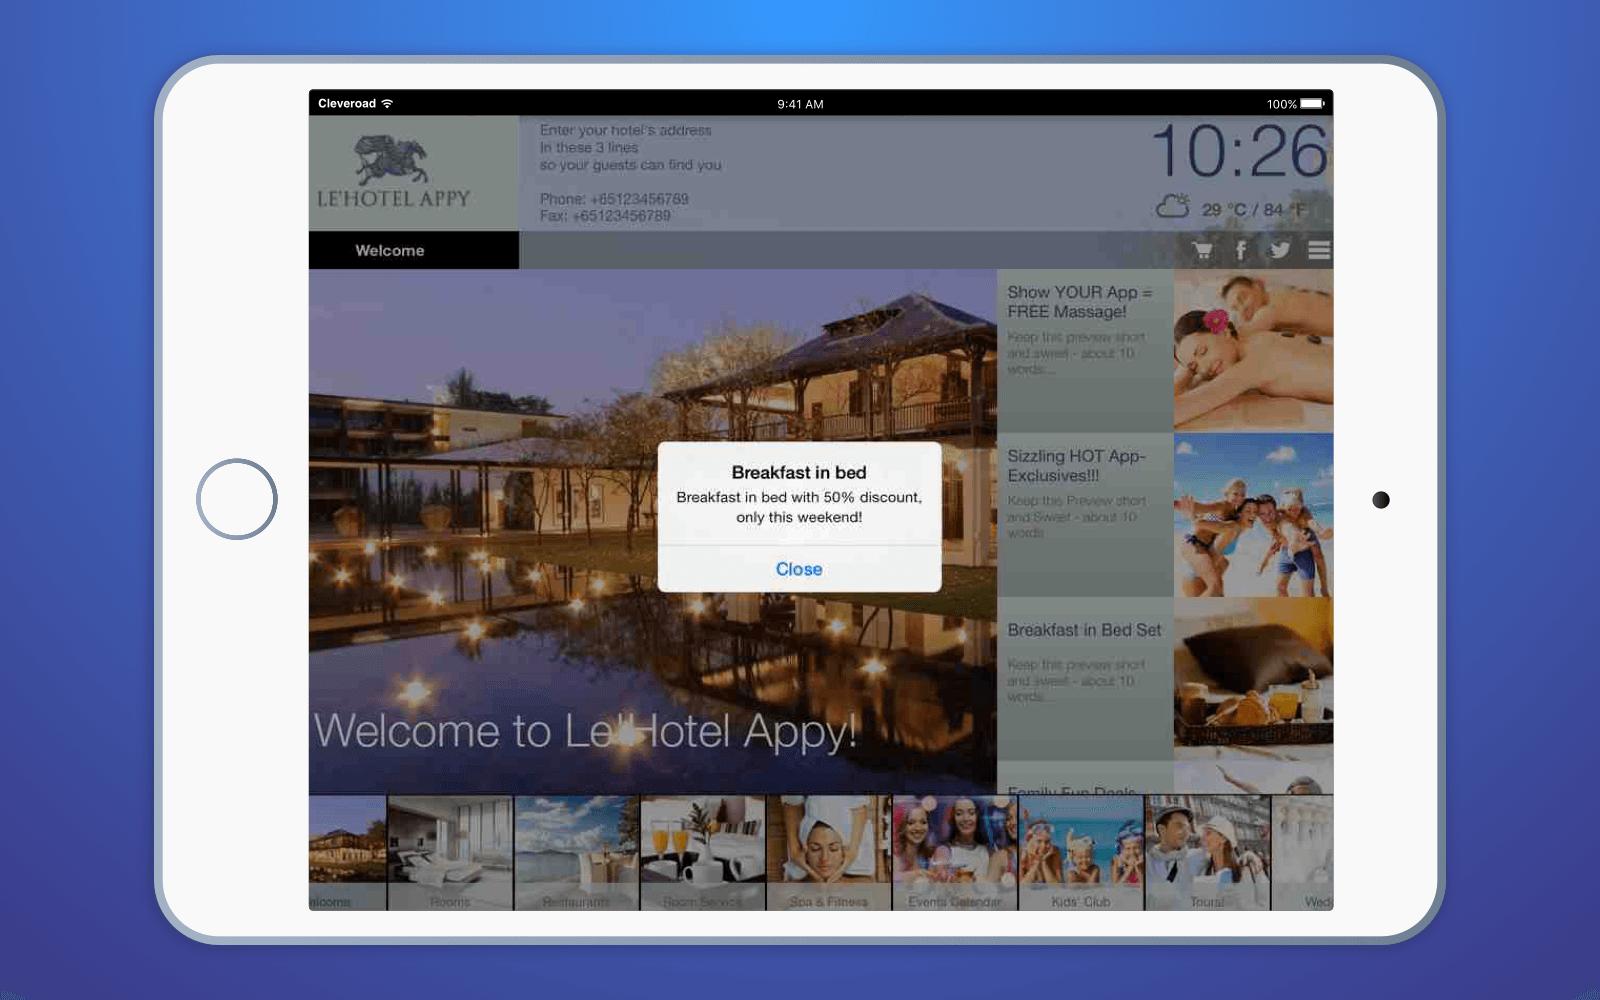 Hotel application: Push notifications